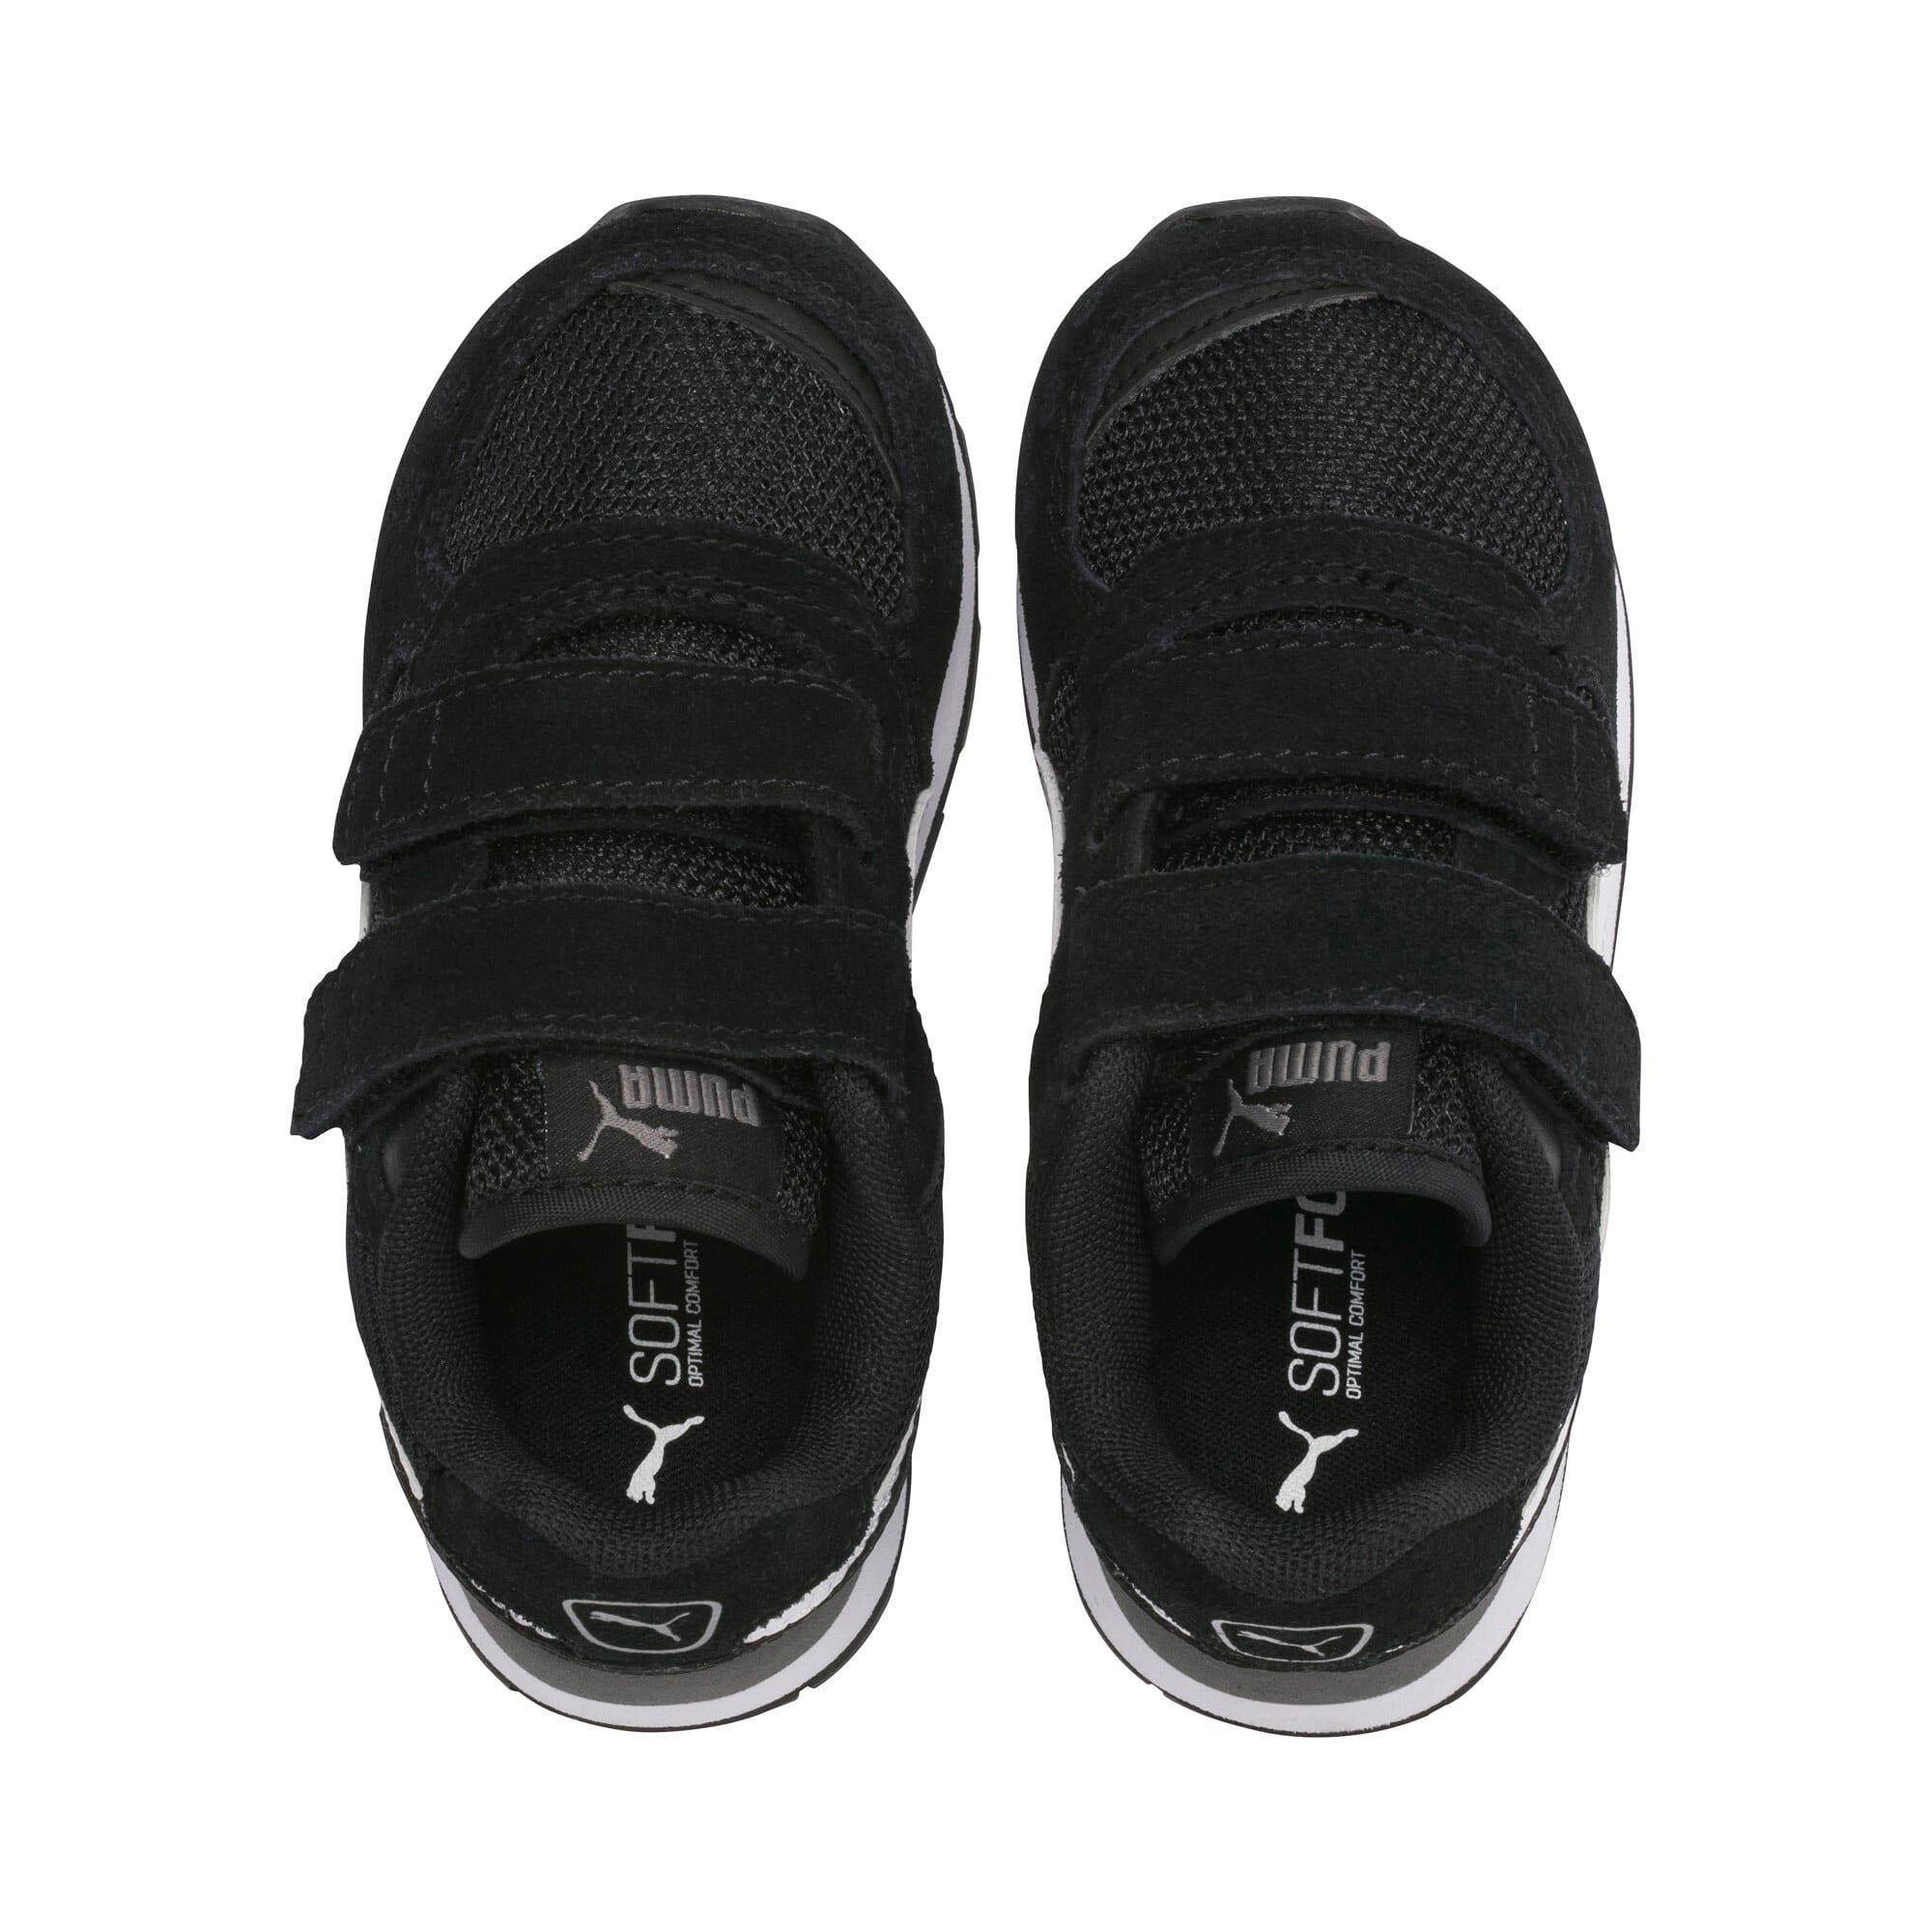 Thumbnail 6 of Vista Little Kids' Shoes, Puma Black-Puma White, medium